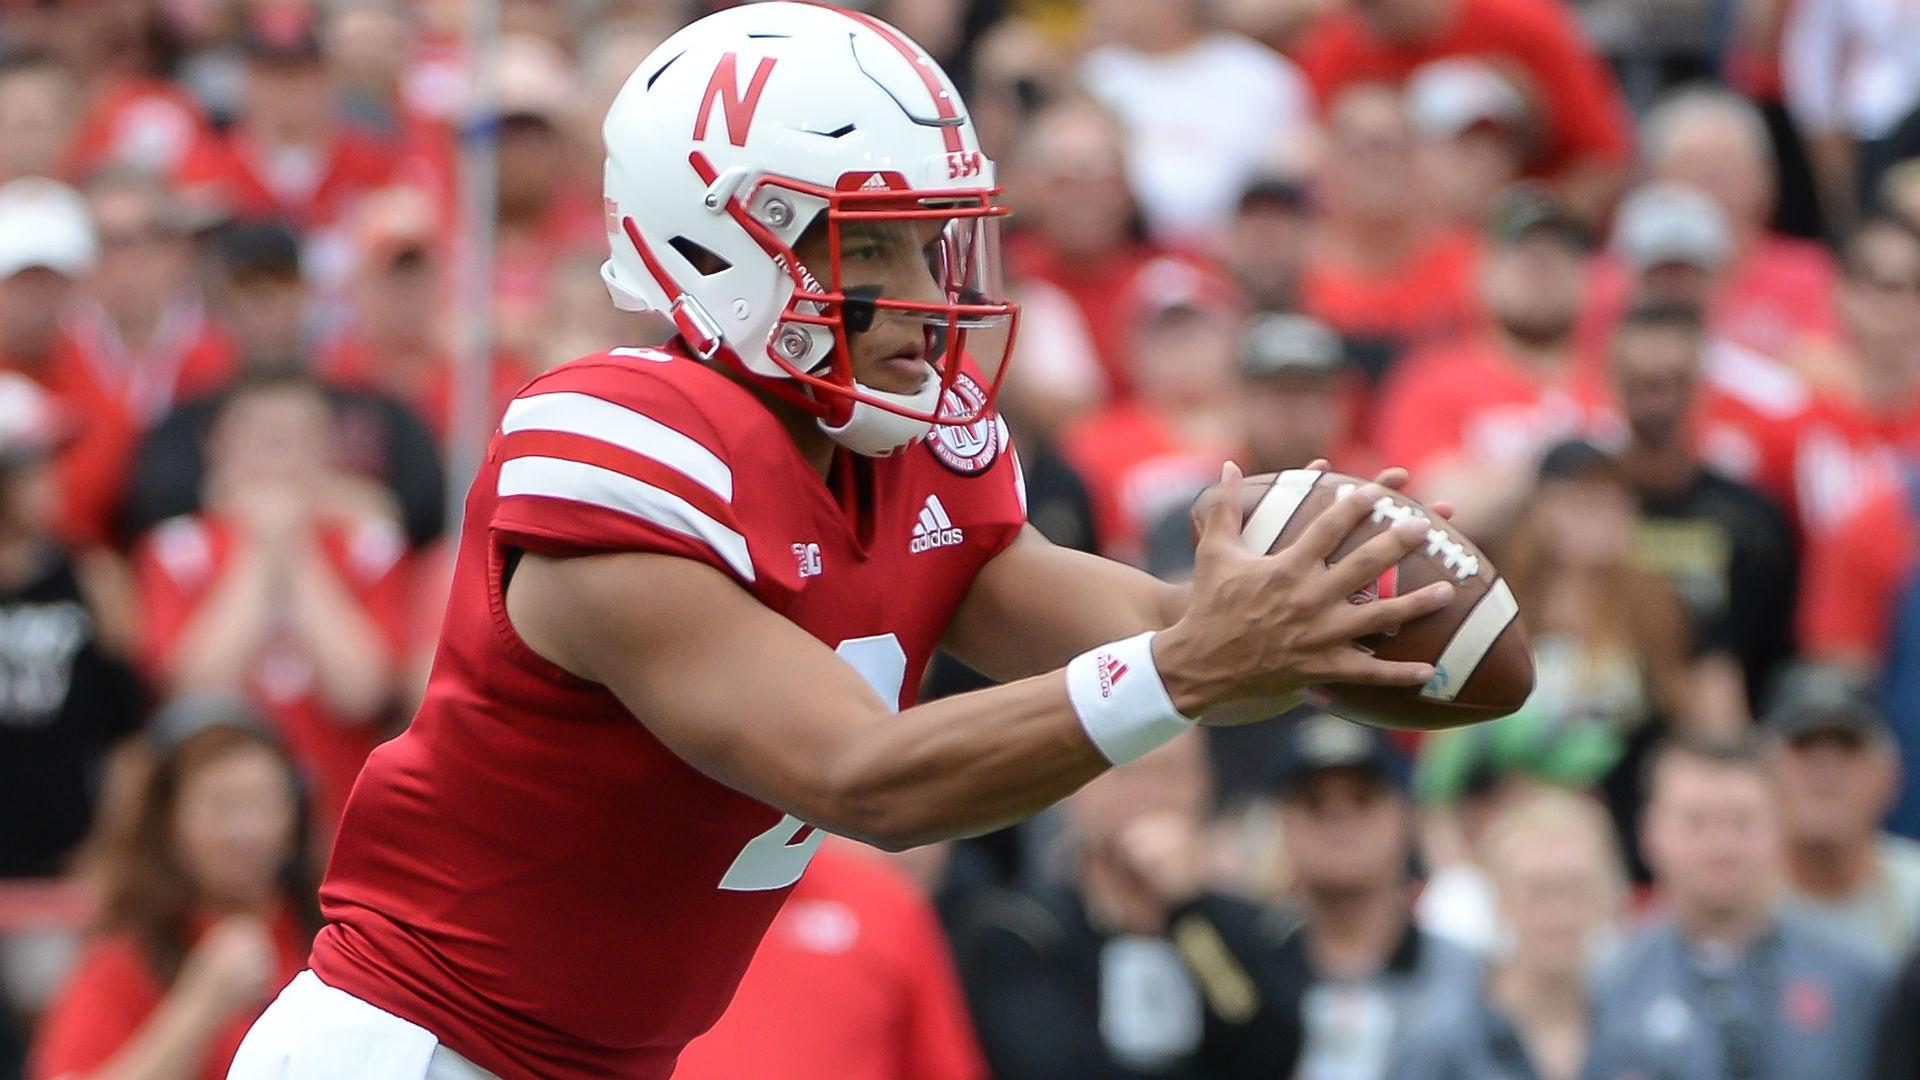 New Injury Update For Nebraska QB Adrian Martinez